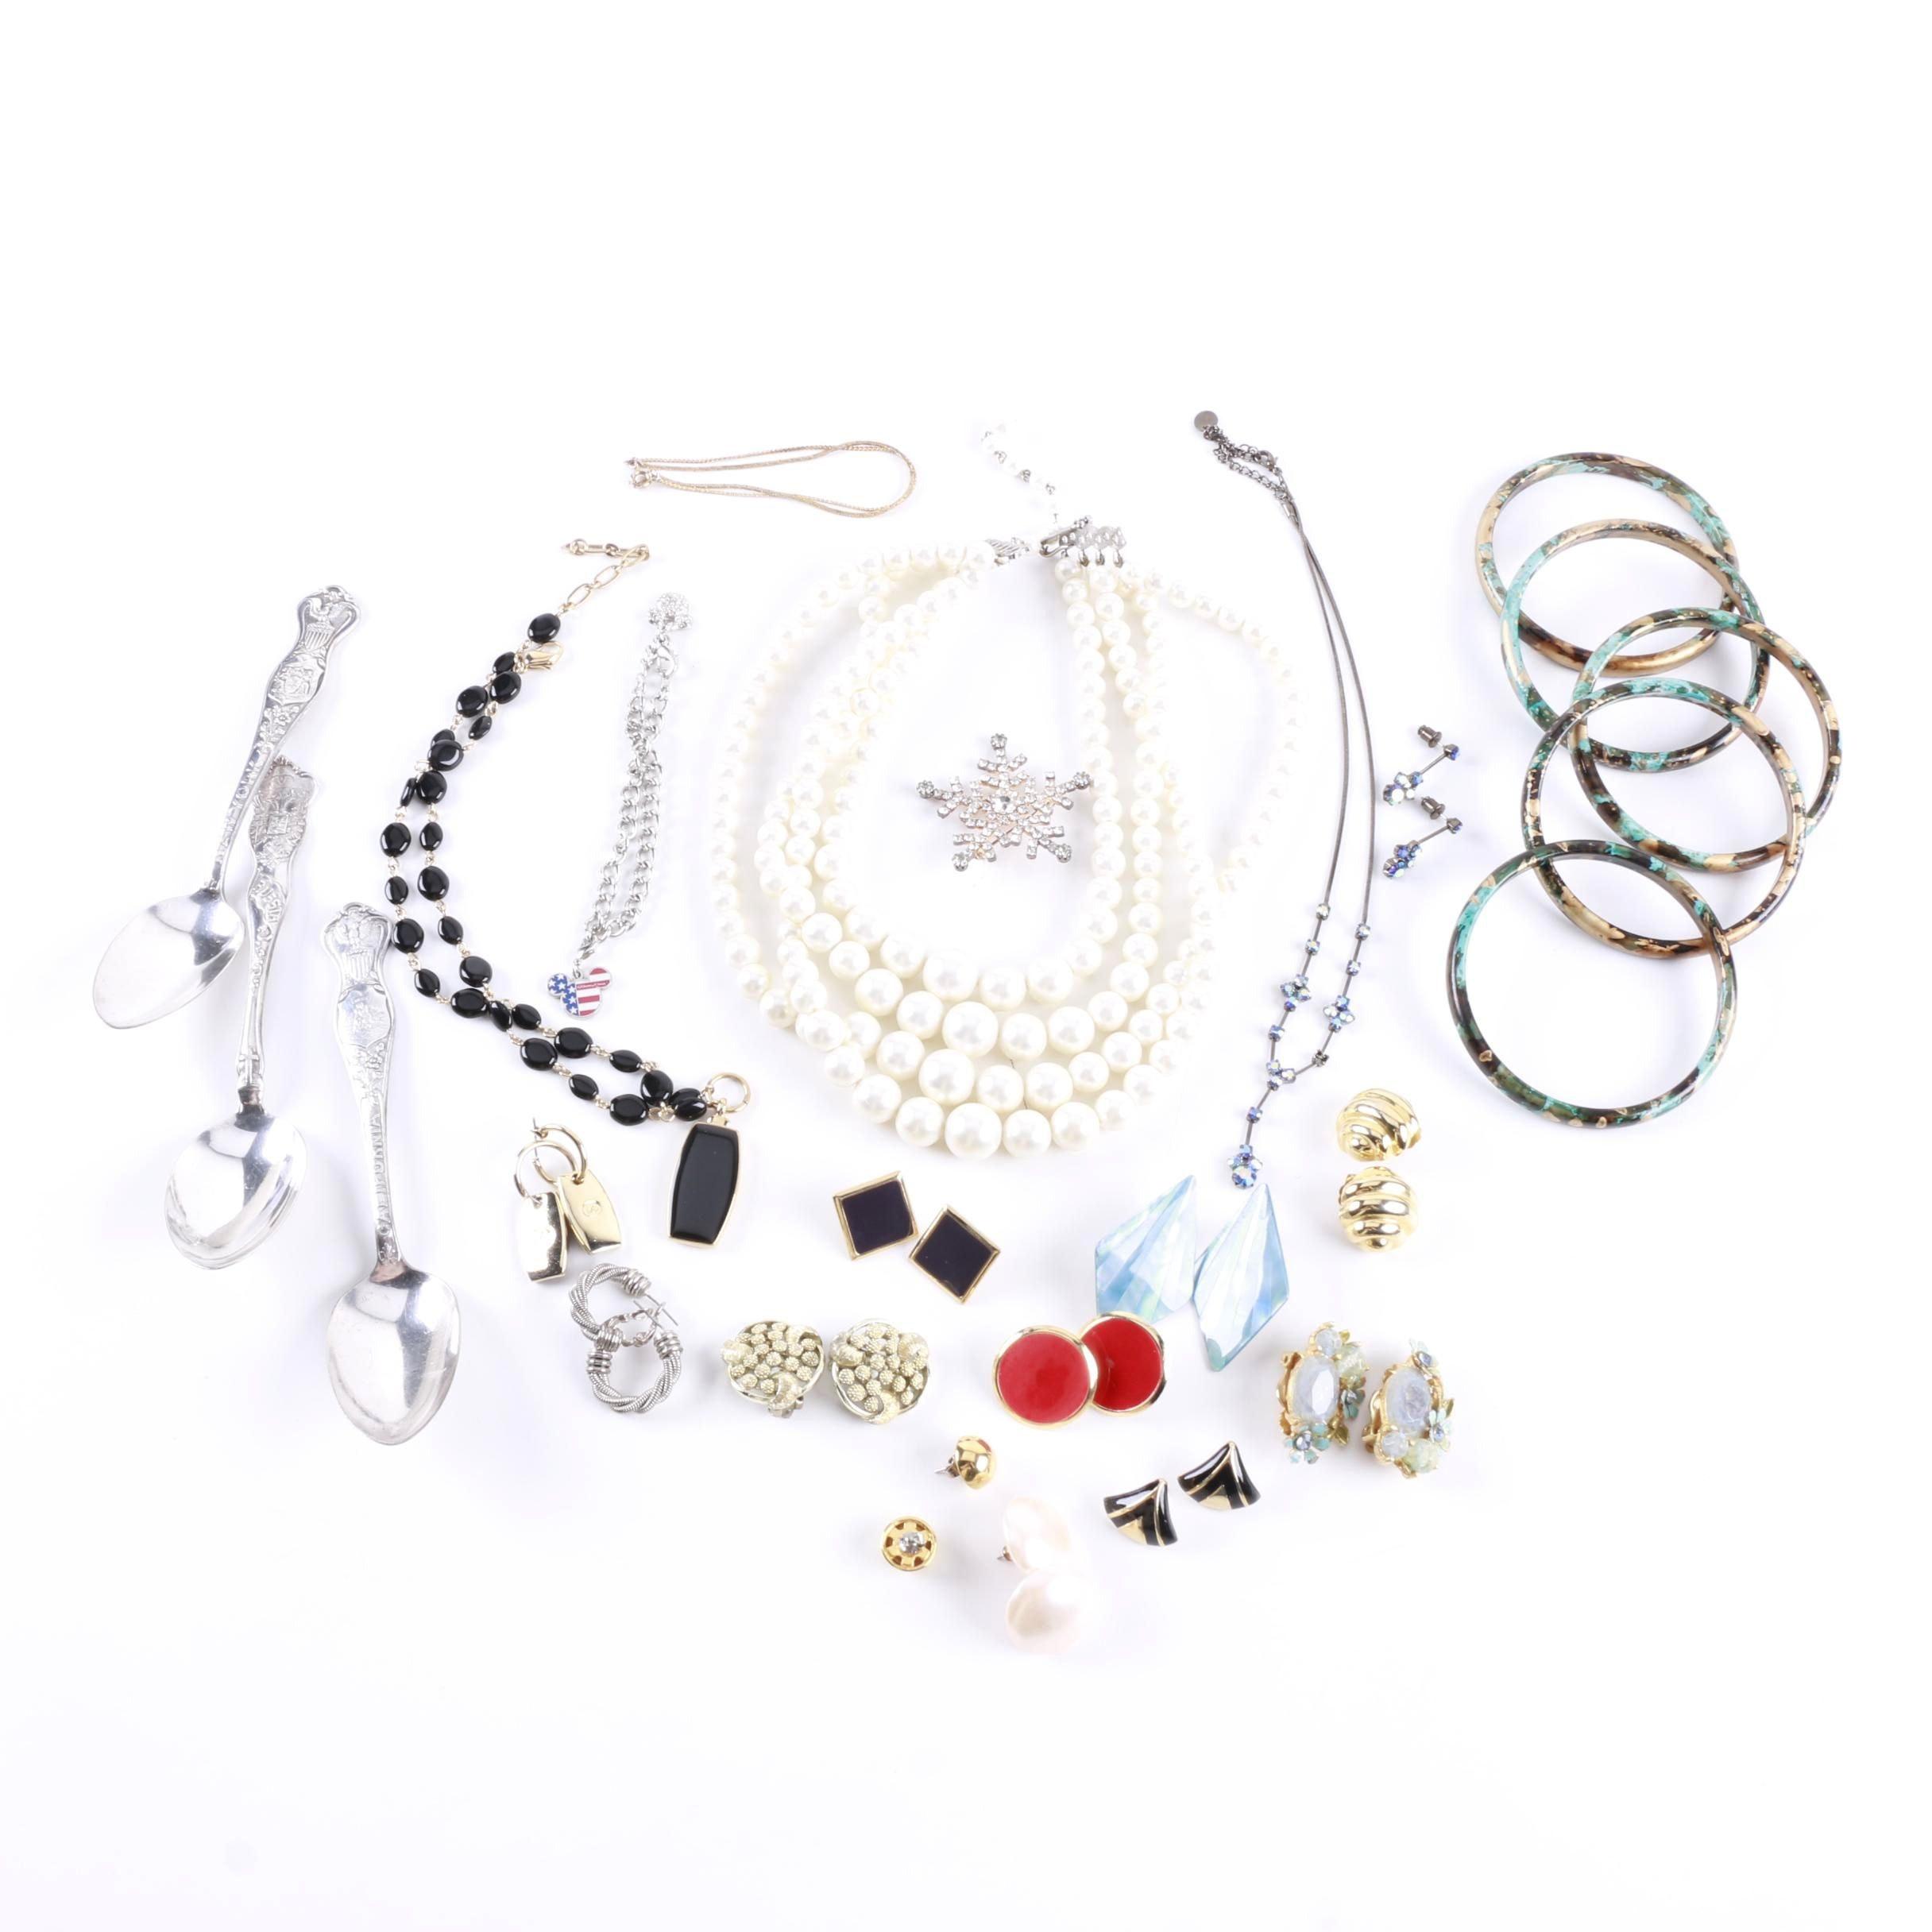 Costume Jewelry Assortment Including Disney and Coro